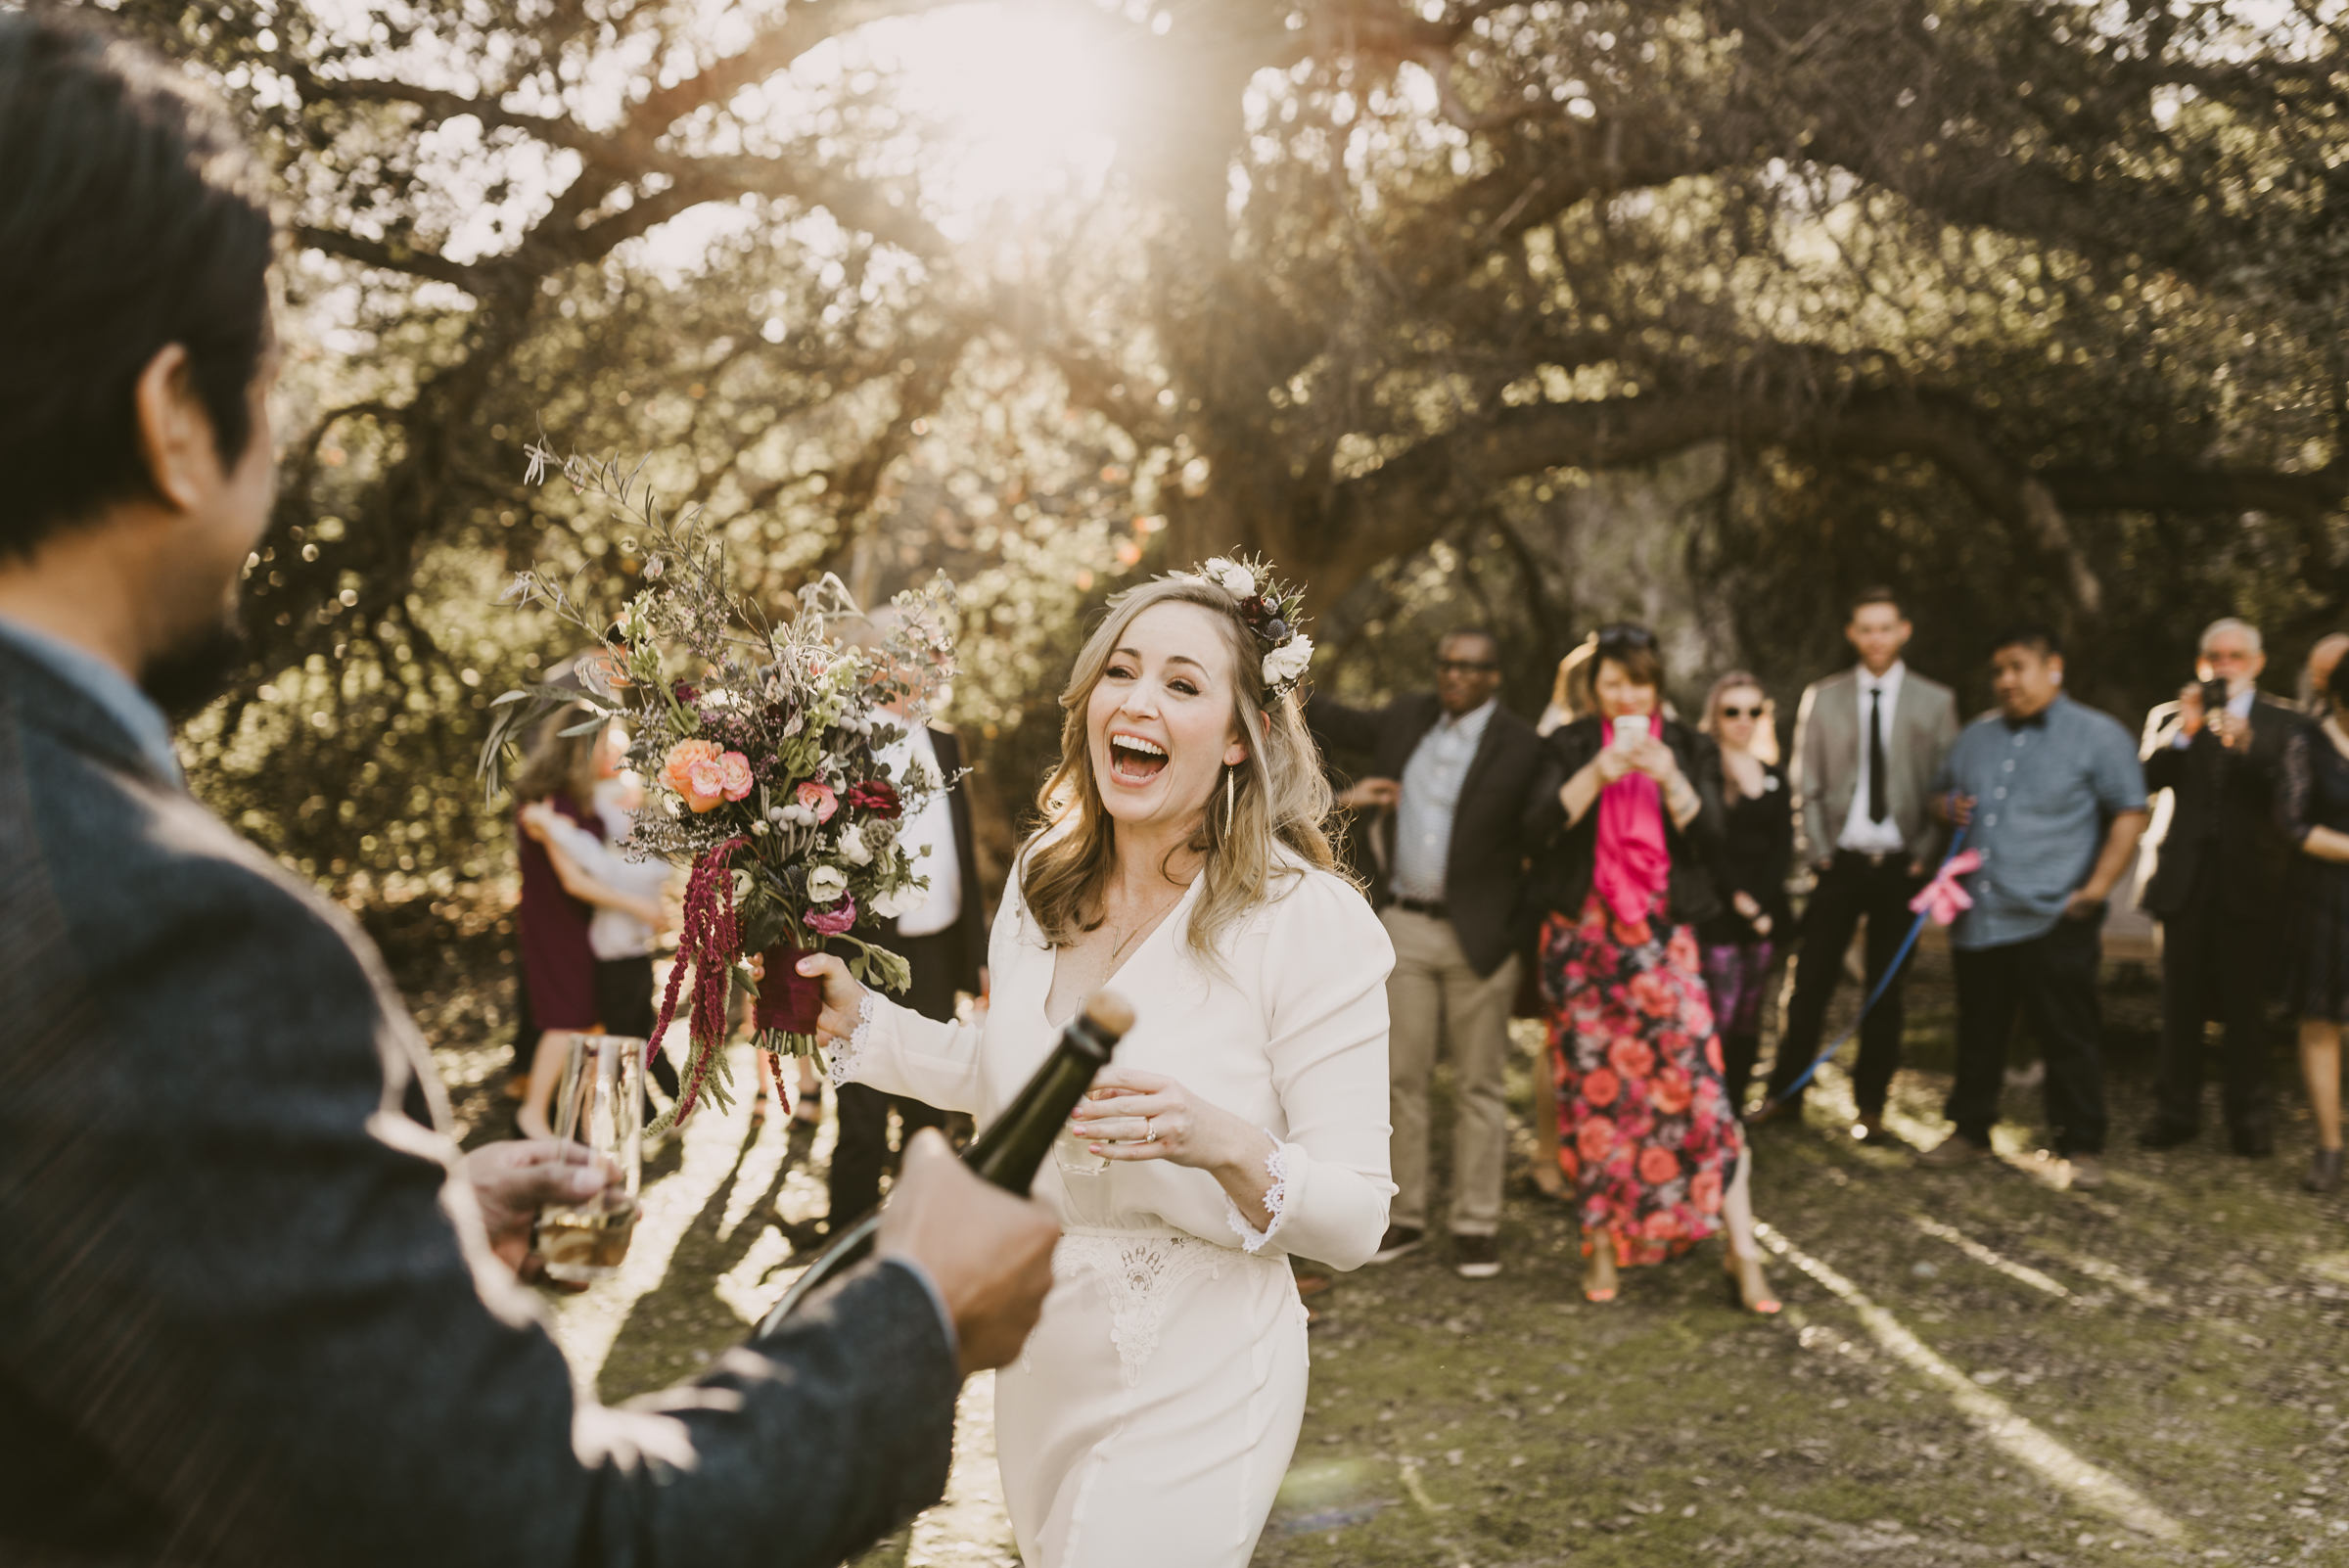 ©Isaiah + Taylor Photography - Intimate Elopement, Eaton Canyon, Los Angeles Wedding Photographer-47.jpg